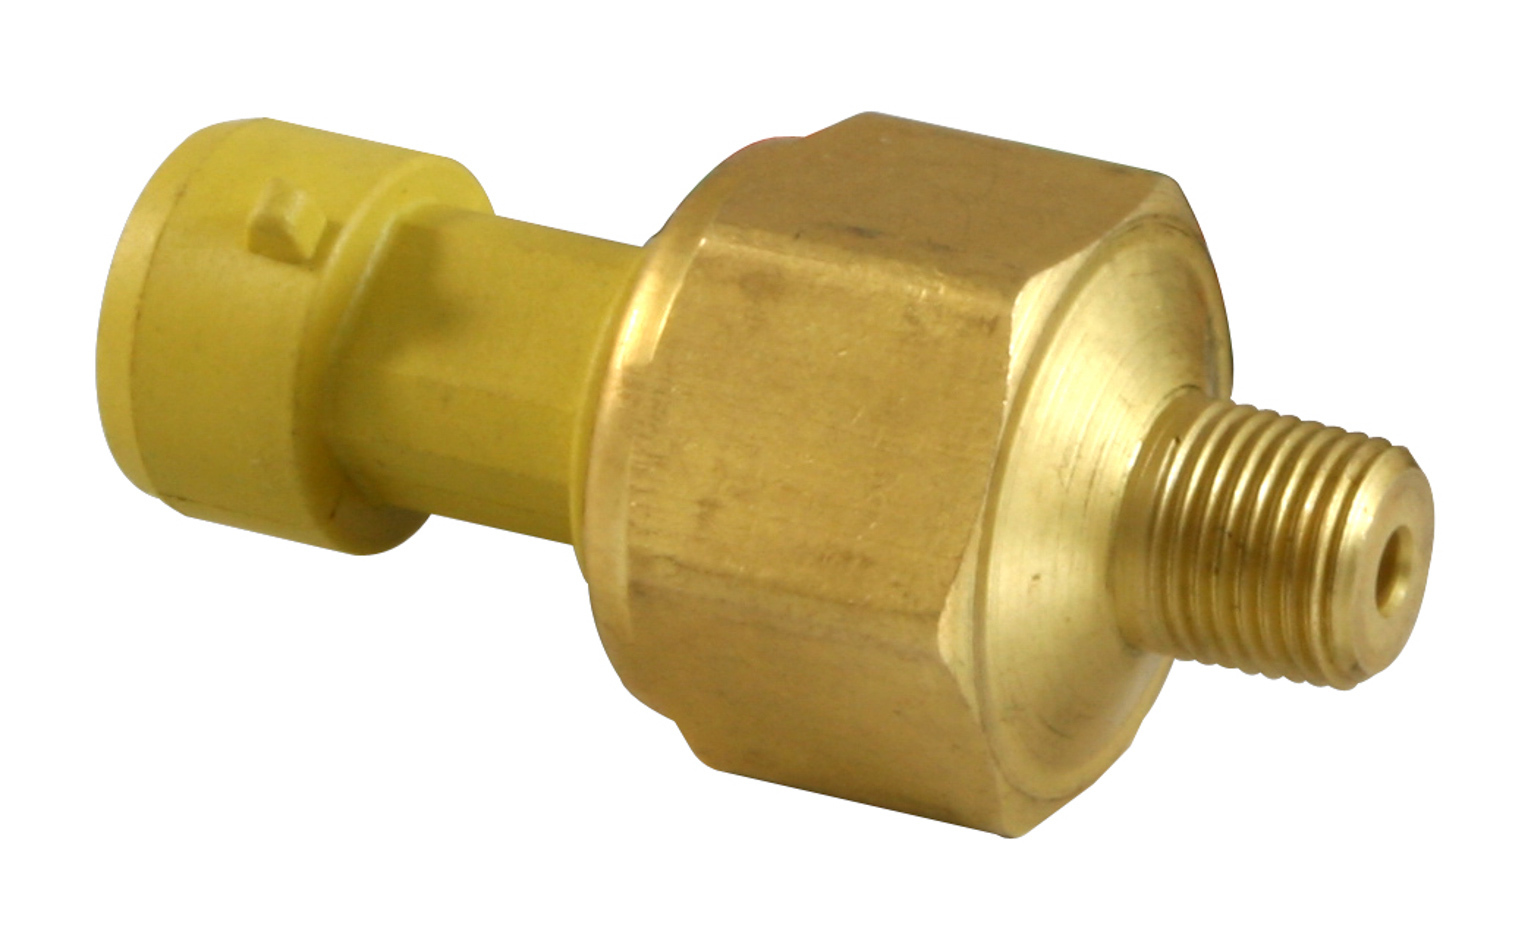 Aem 50psi or 3.5 Bar Brass Sensor Kit